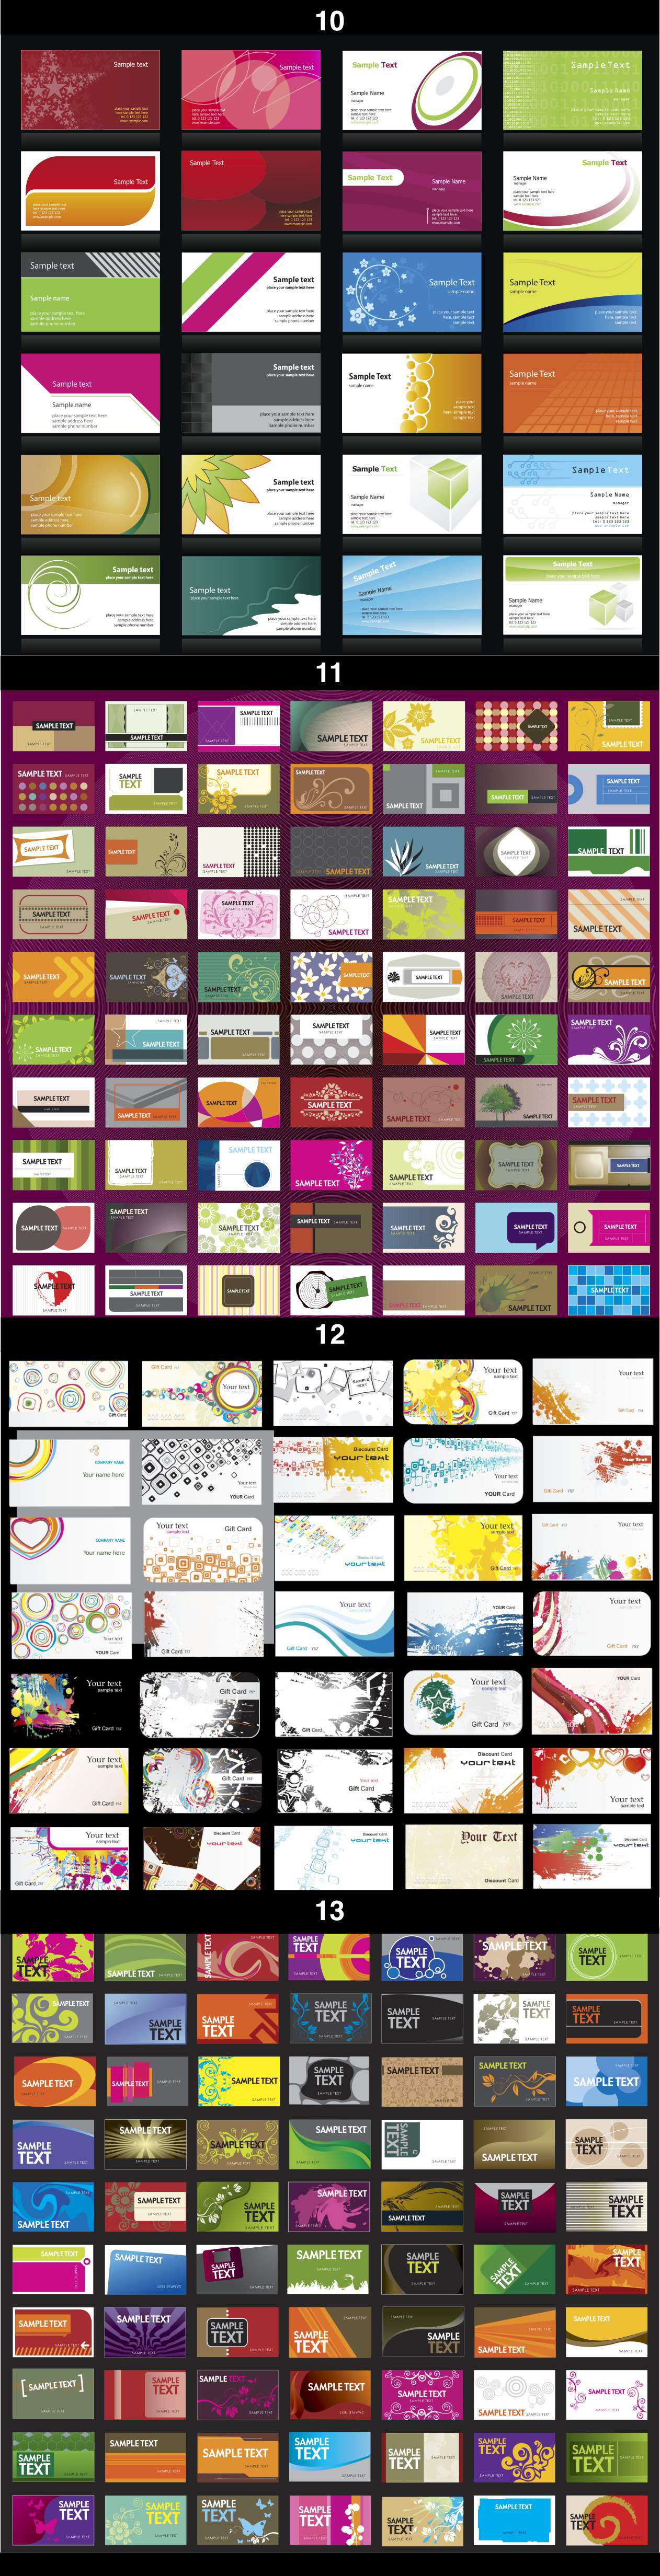 Biz card samples 2-Layout 1 3